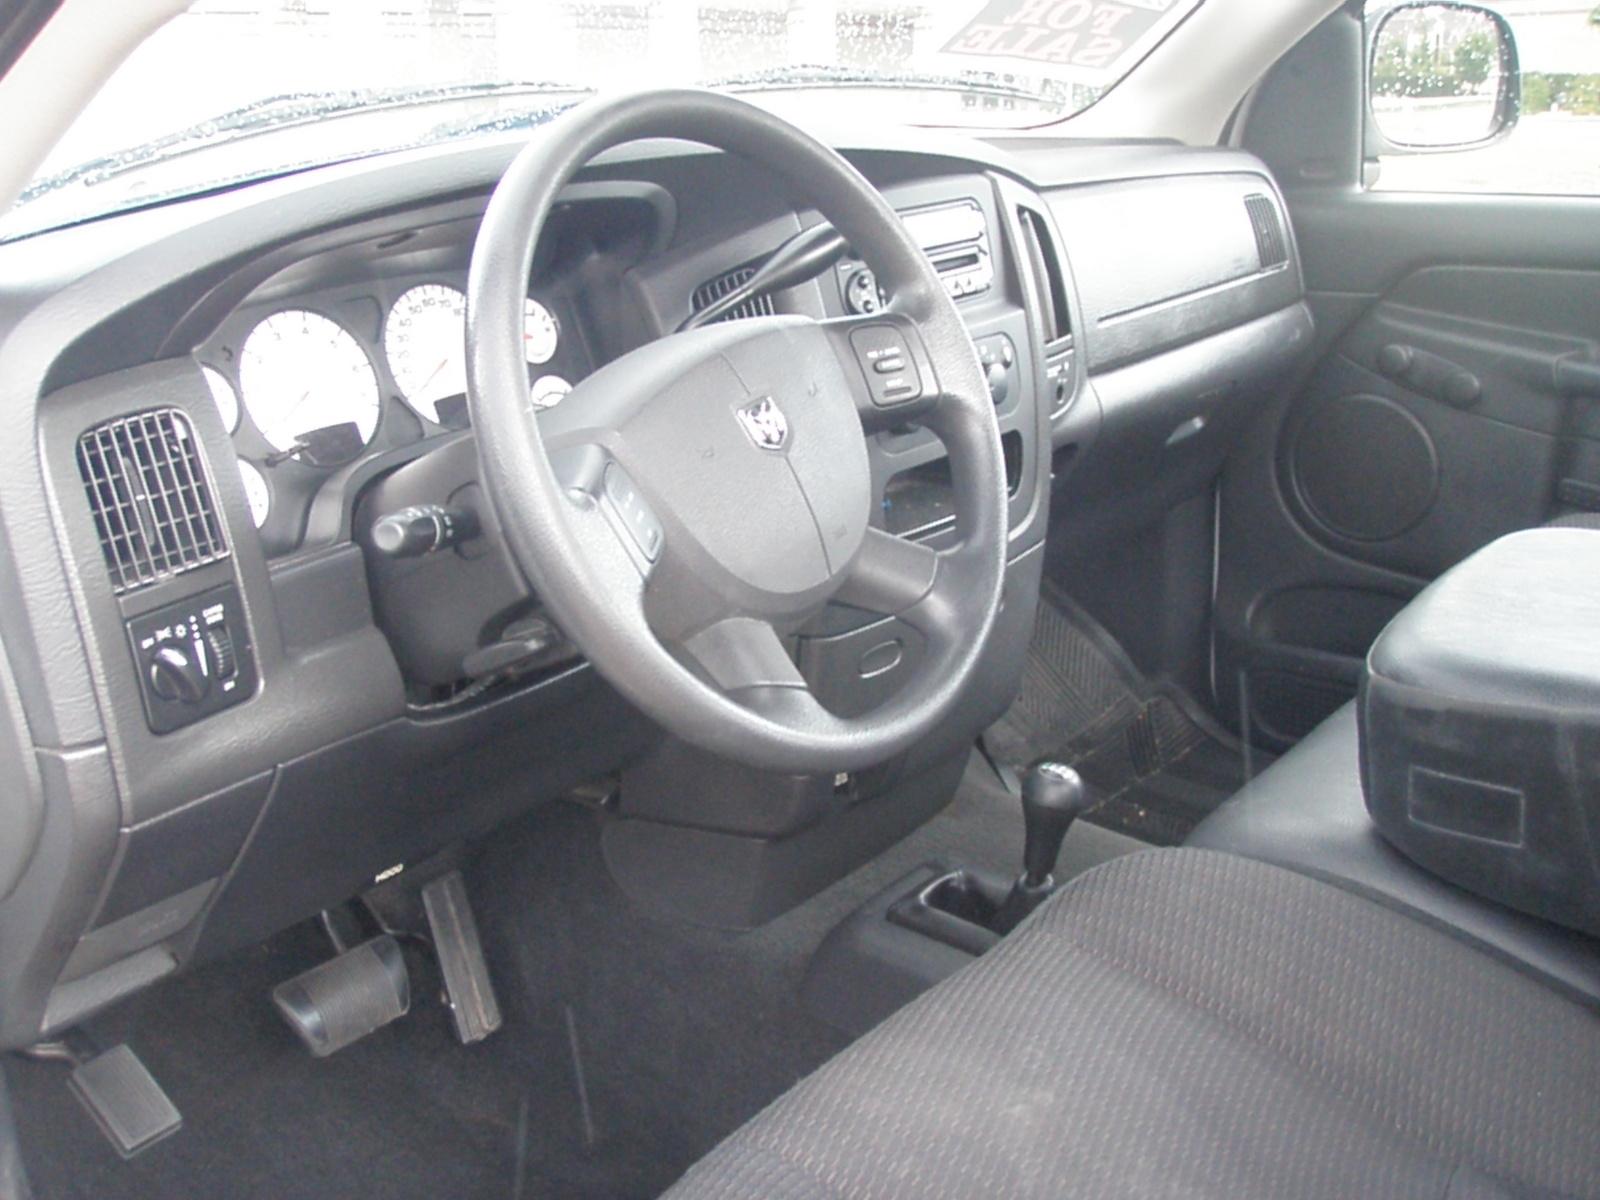 2004 dodge ram pickup 1500 interior pictures cargurus. Black Bedroom Furniture Sets. Home Design Ideas